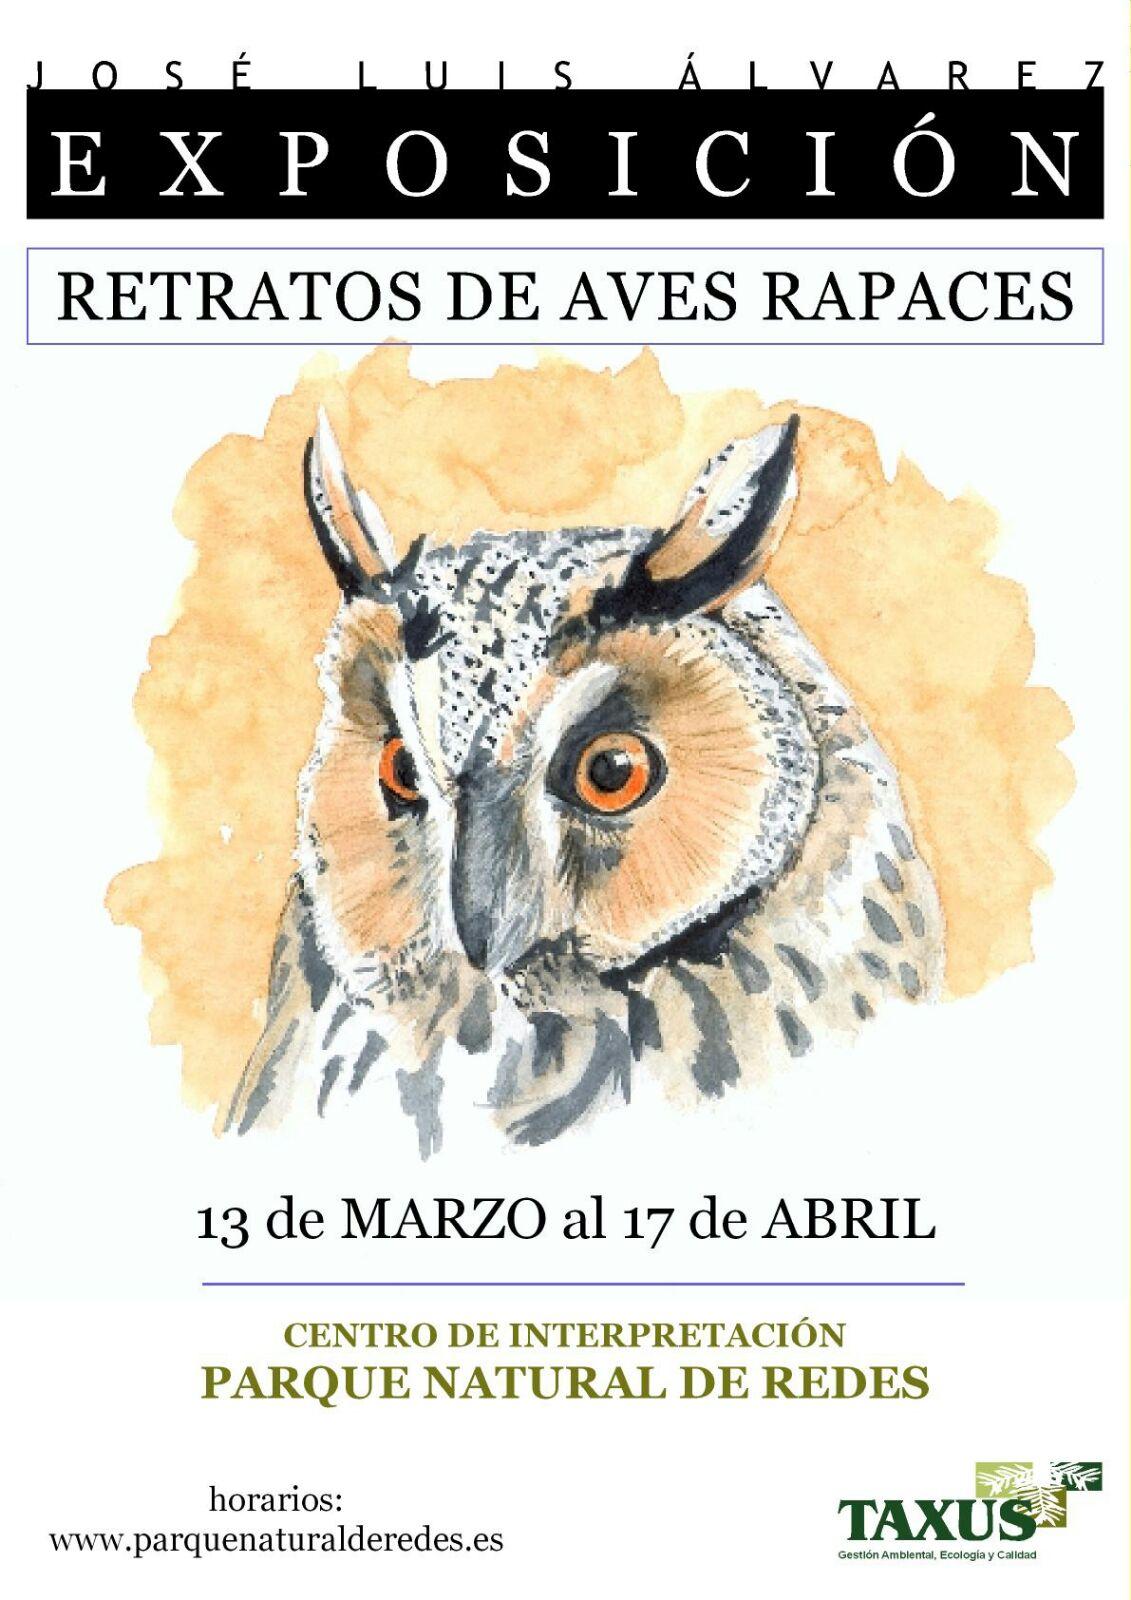 EXPOSICION RETRATOS AVES RAPACES